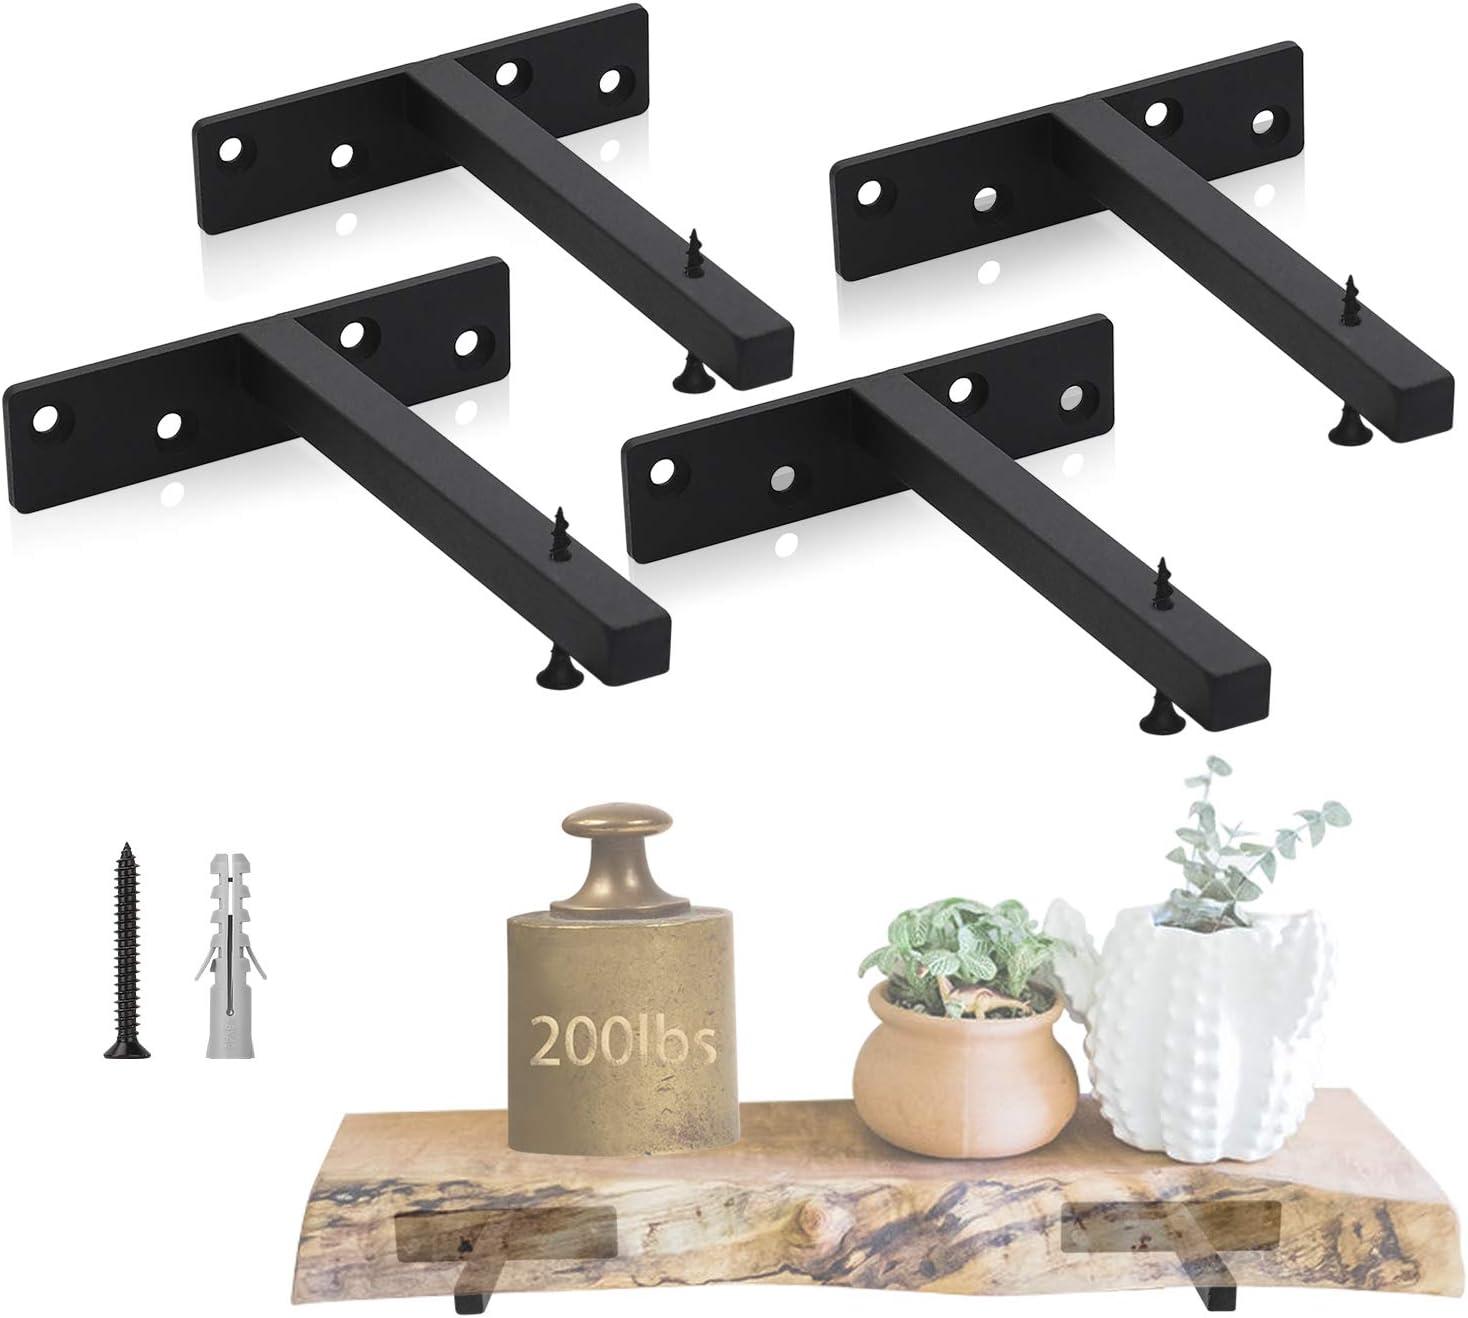 Floating Brackets for Shelves Heavy Duty 6 Inch Black Steel Hardware Shelf Supports Blind Bracket for Wood Shelving, 4 Pack